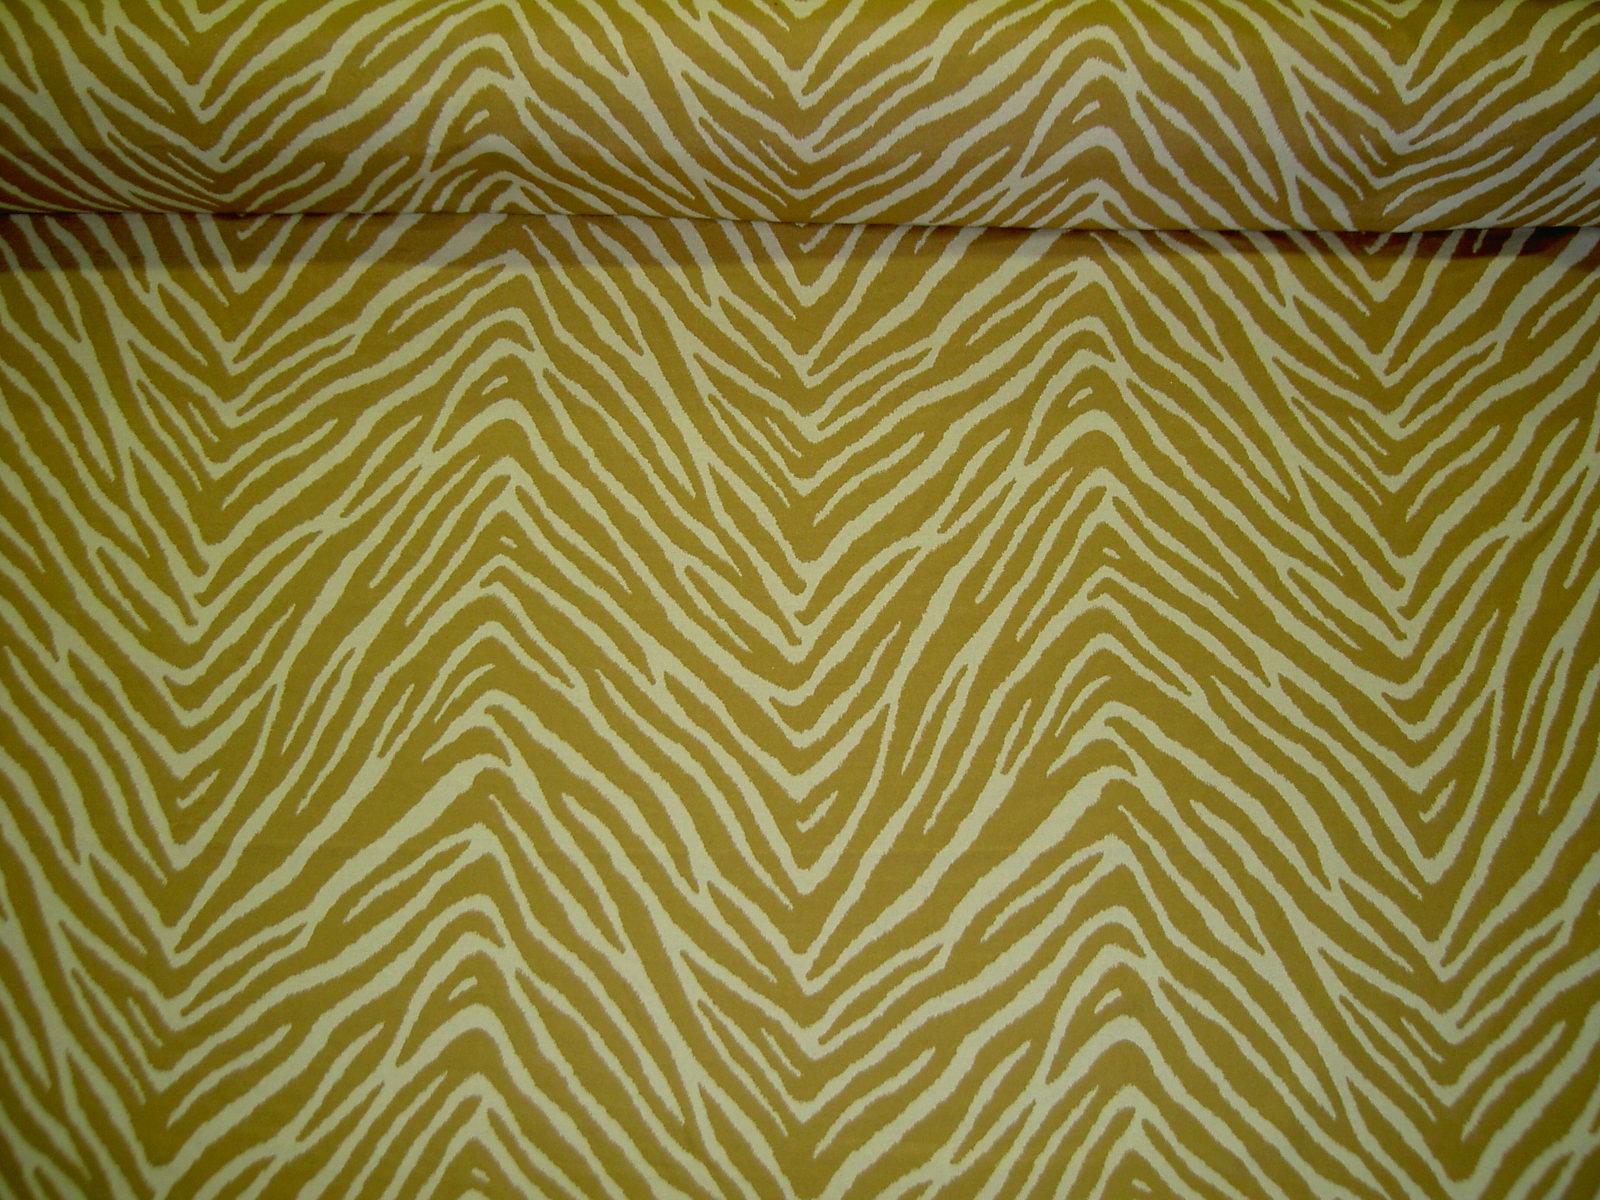 Pkaufmannbengalsandm020807 002 for Home fabrics